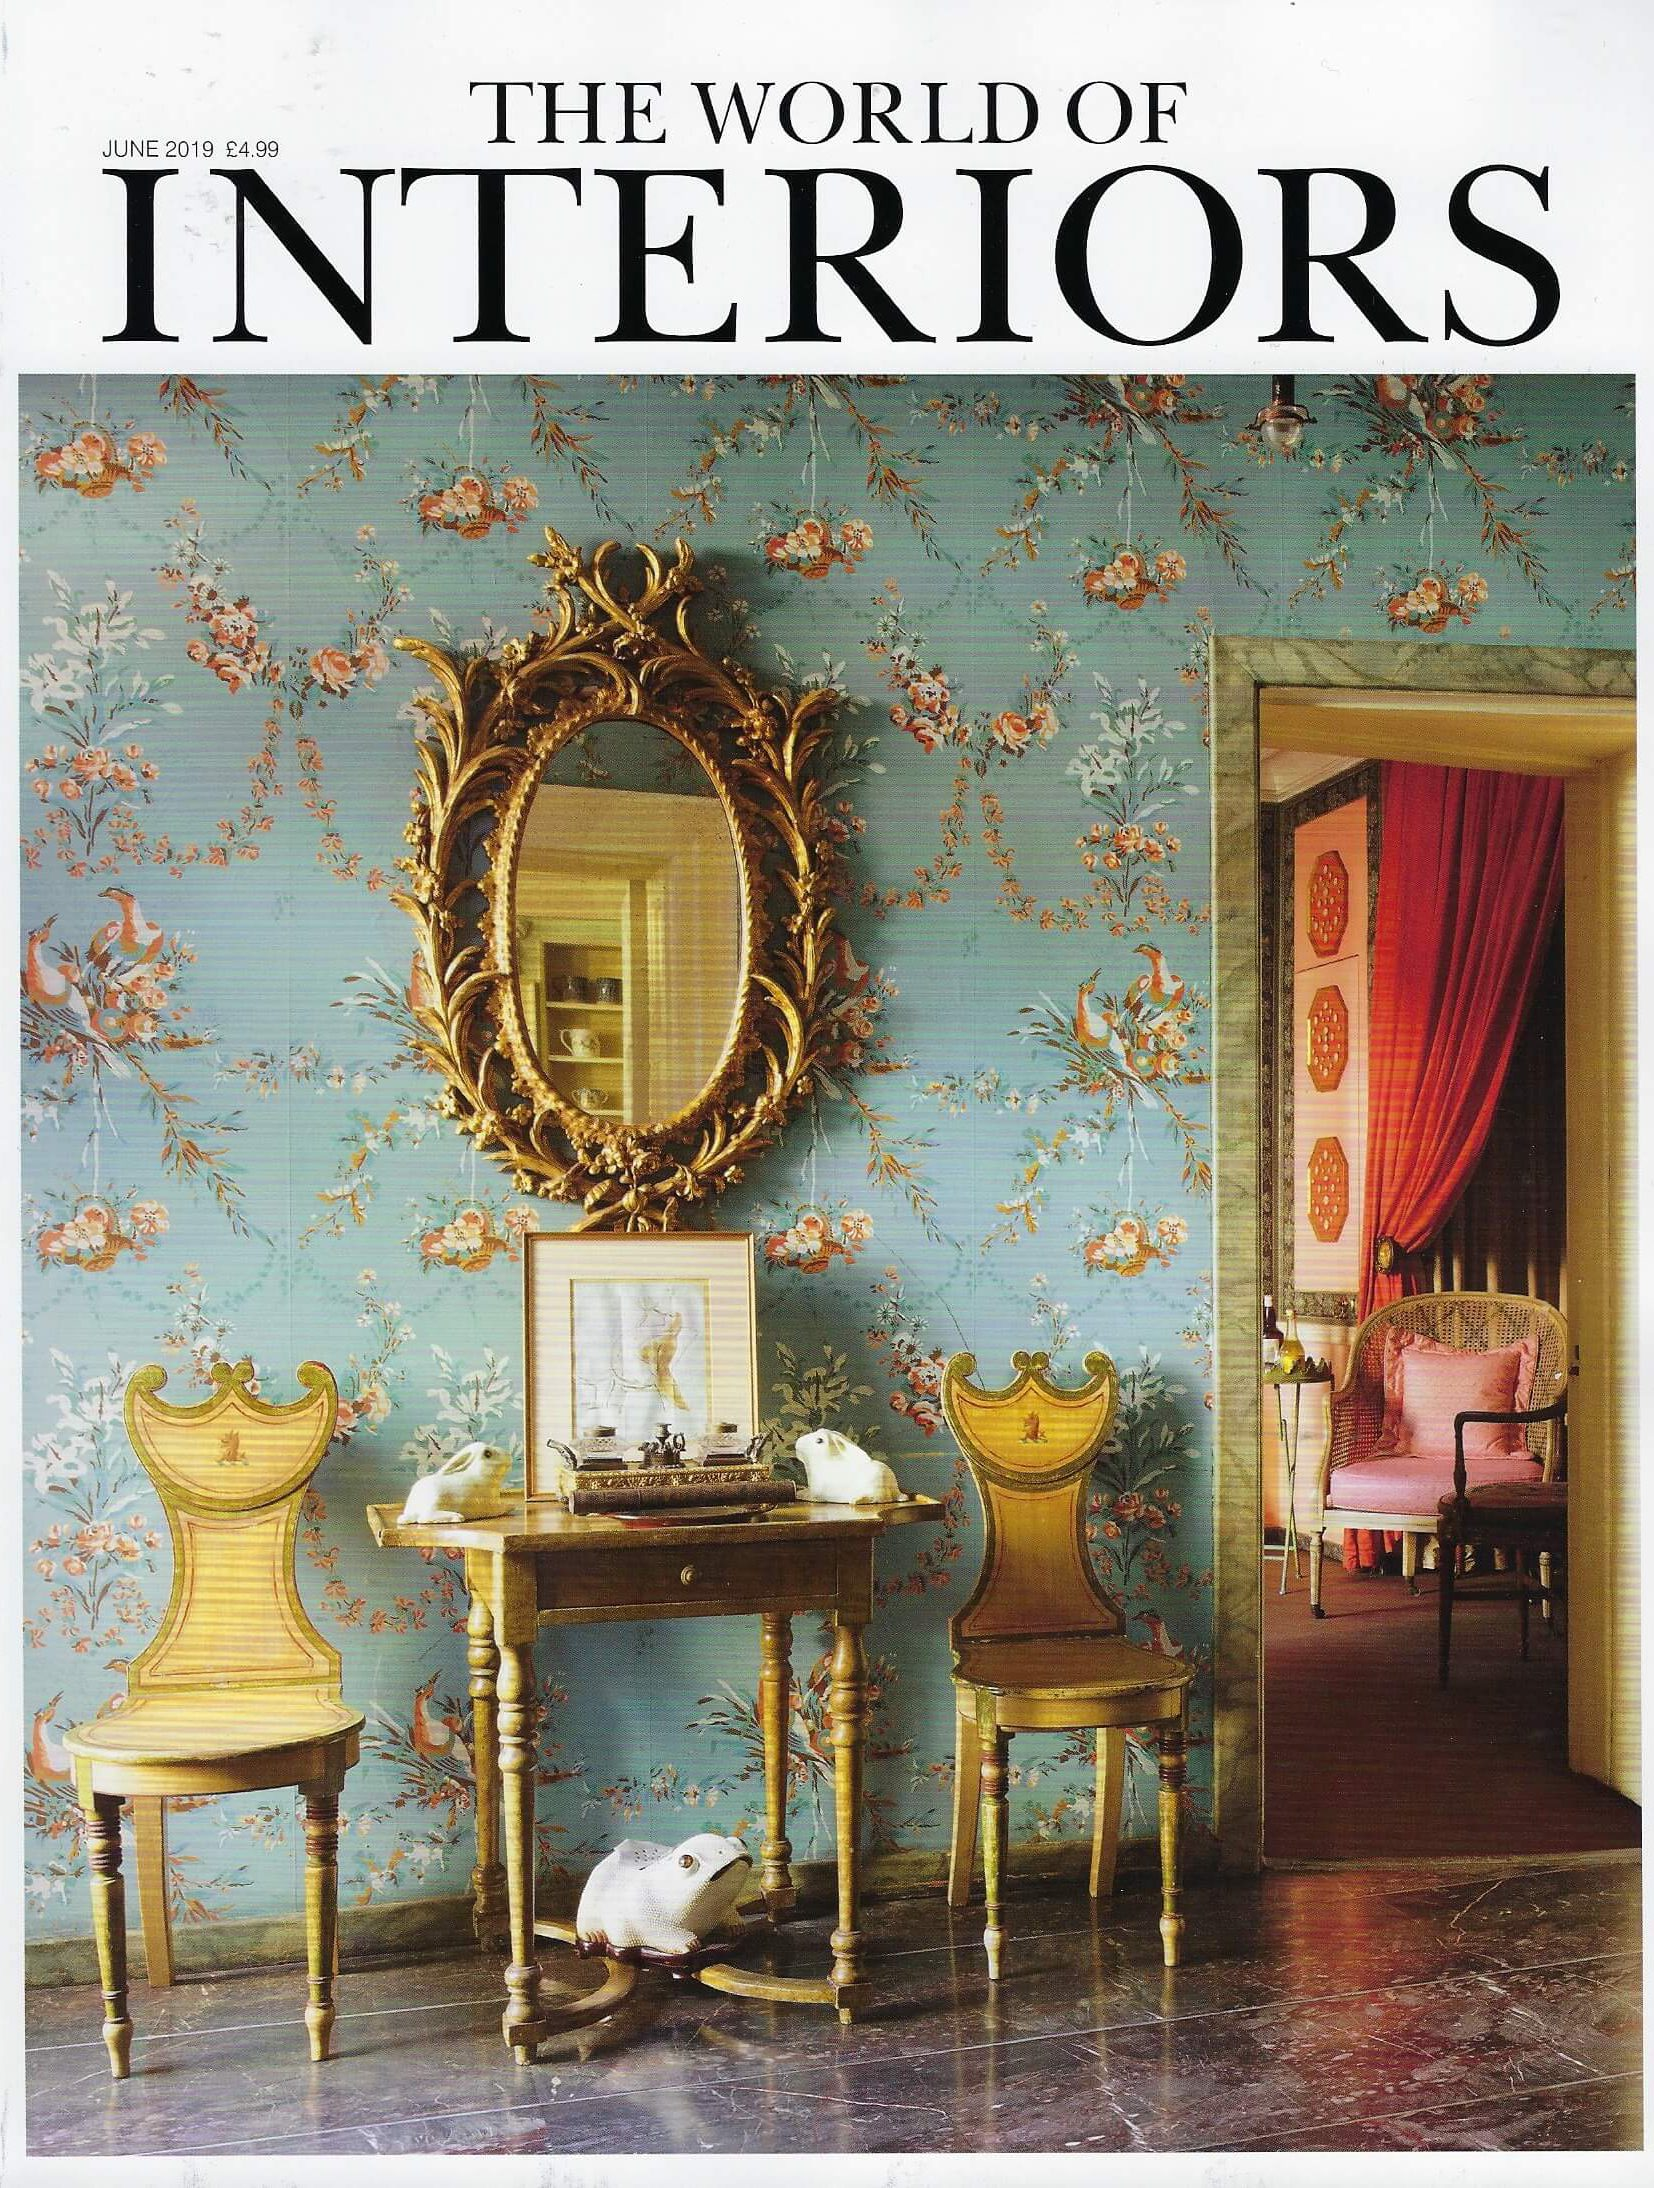 2019.06-World-of-Interiors-June-19-Cover-1-aspect-ratio-170×225